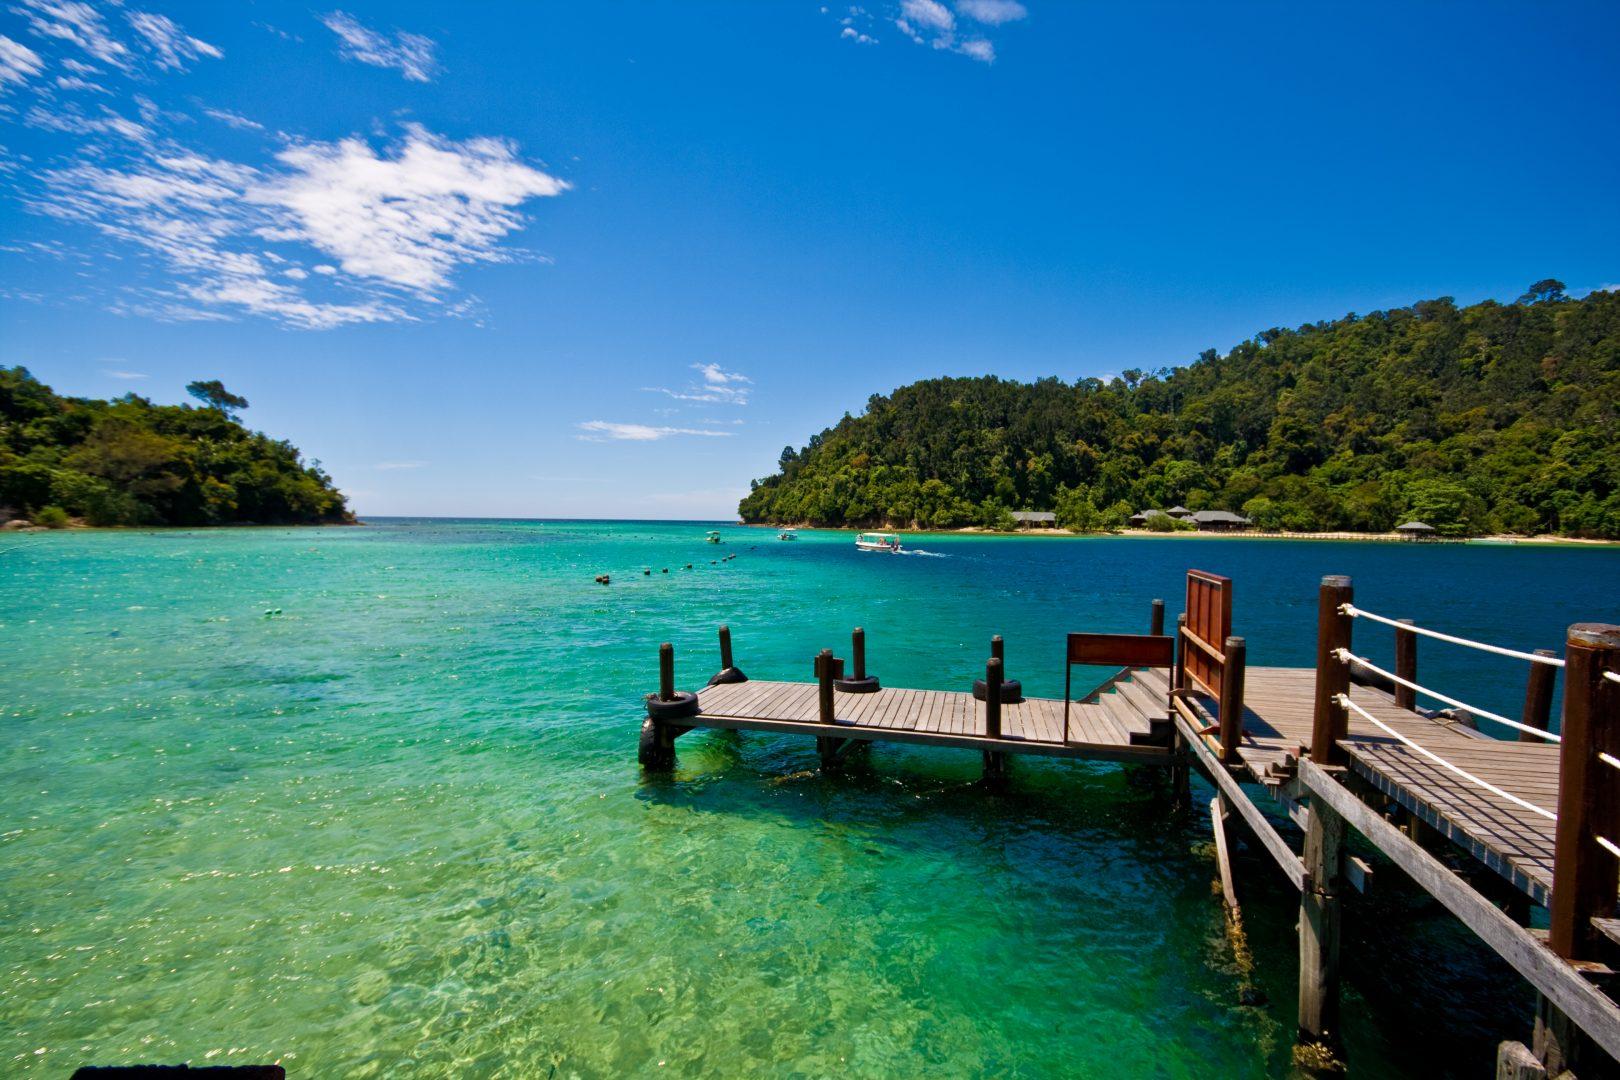 Тур в Куала Лампур + отдых на острове Тиоман